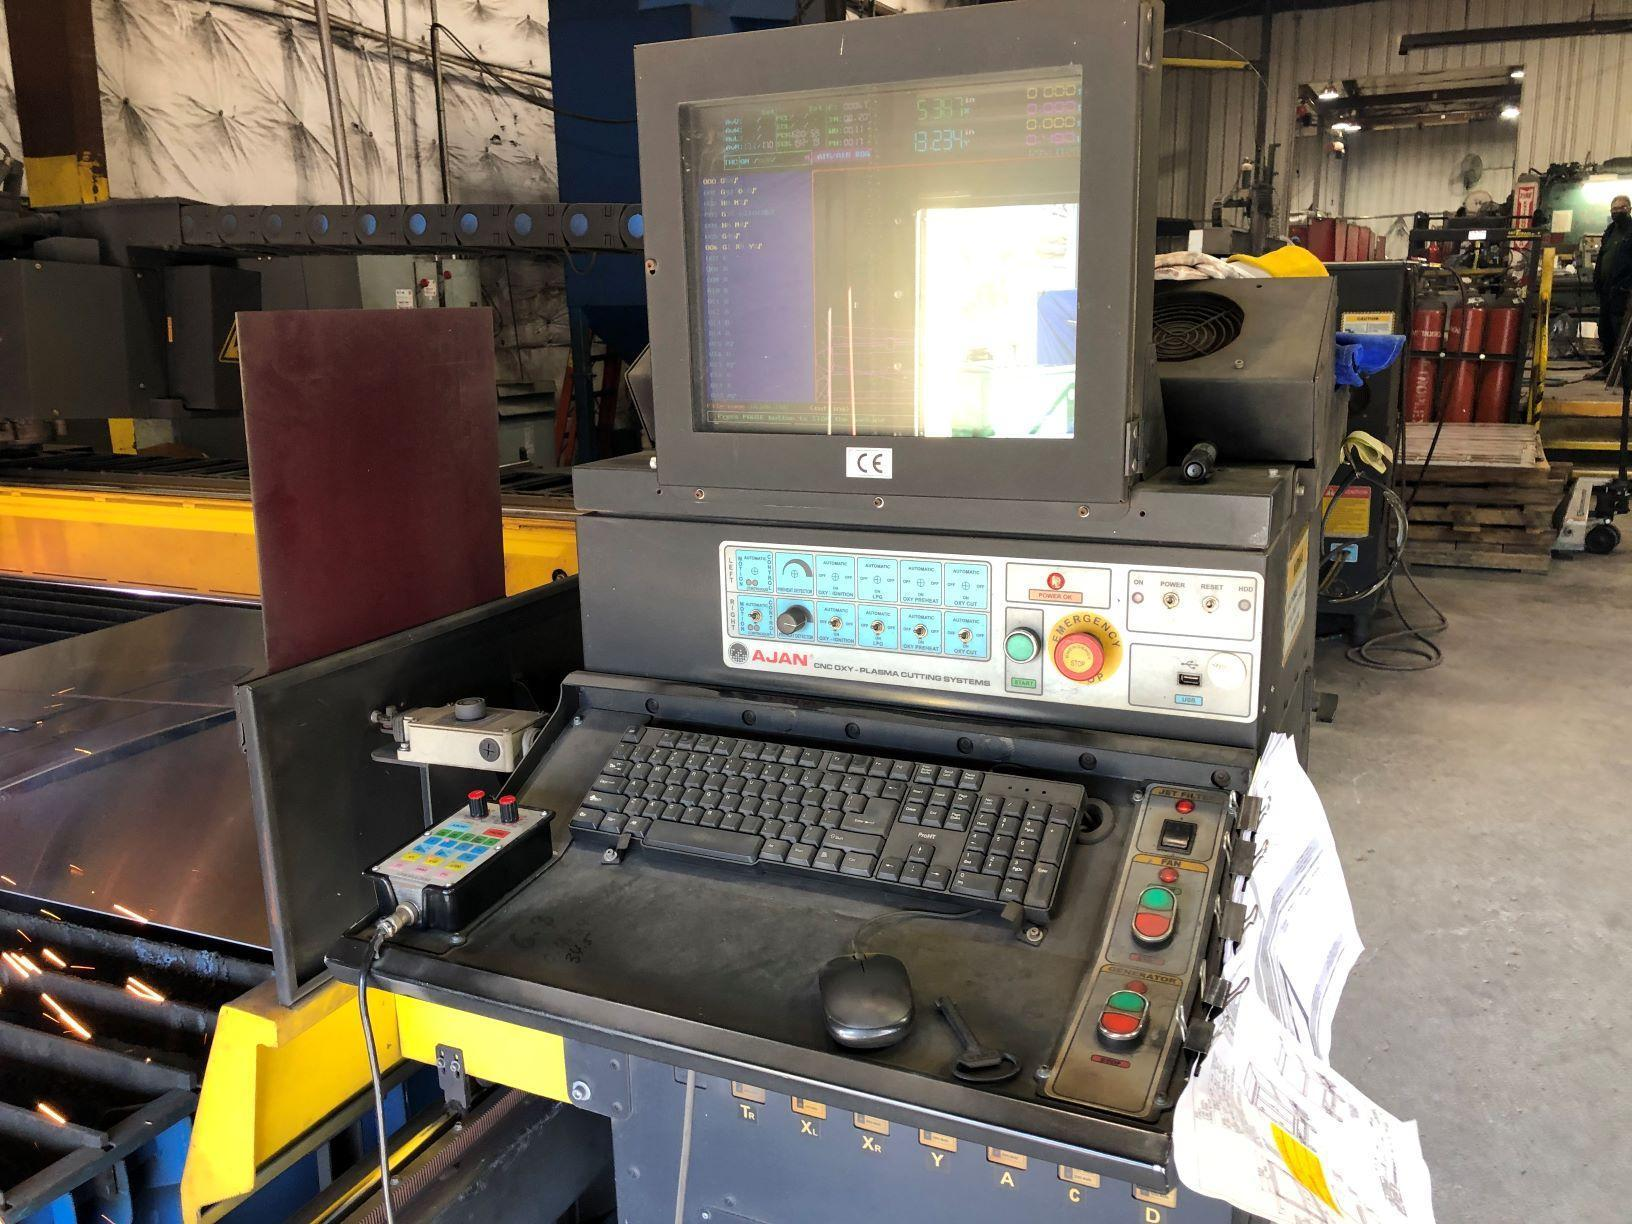 2014 Ajan Plasmasonic 260A 10' x 20' Plasma Cutting Machine